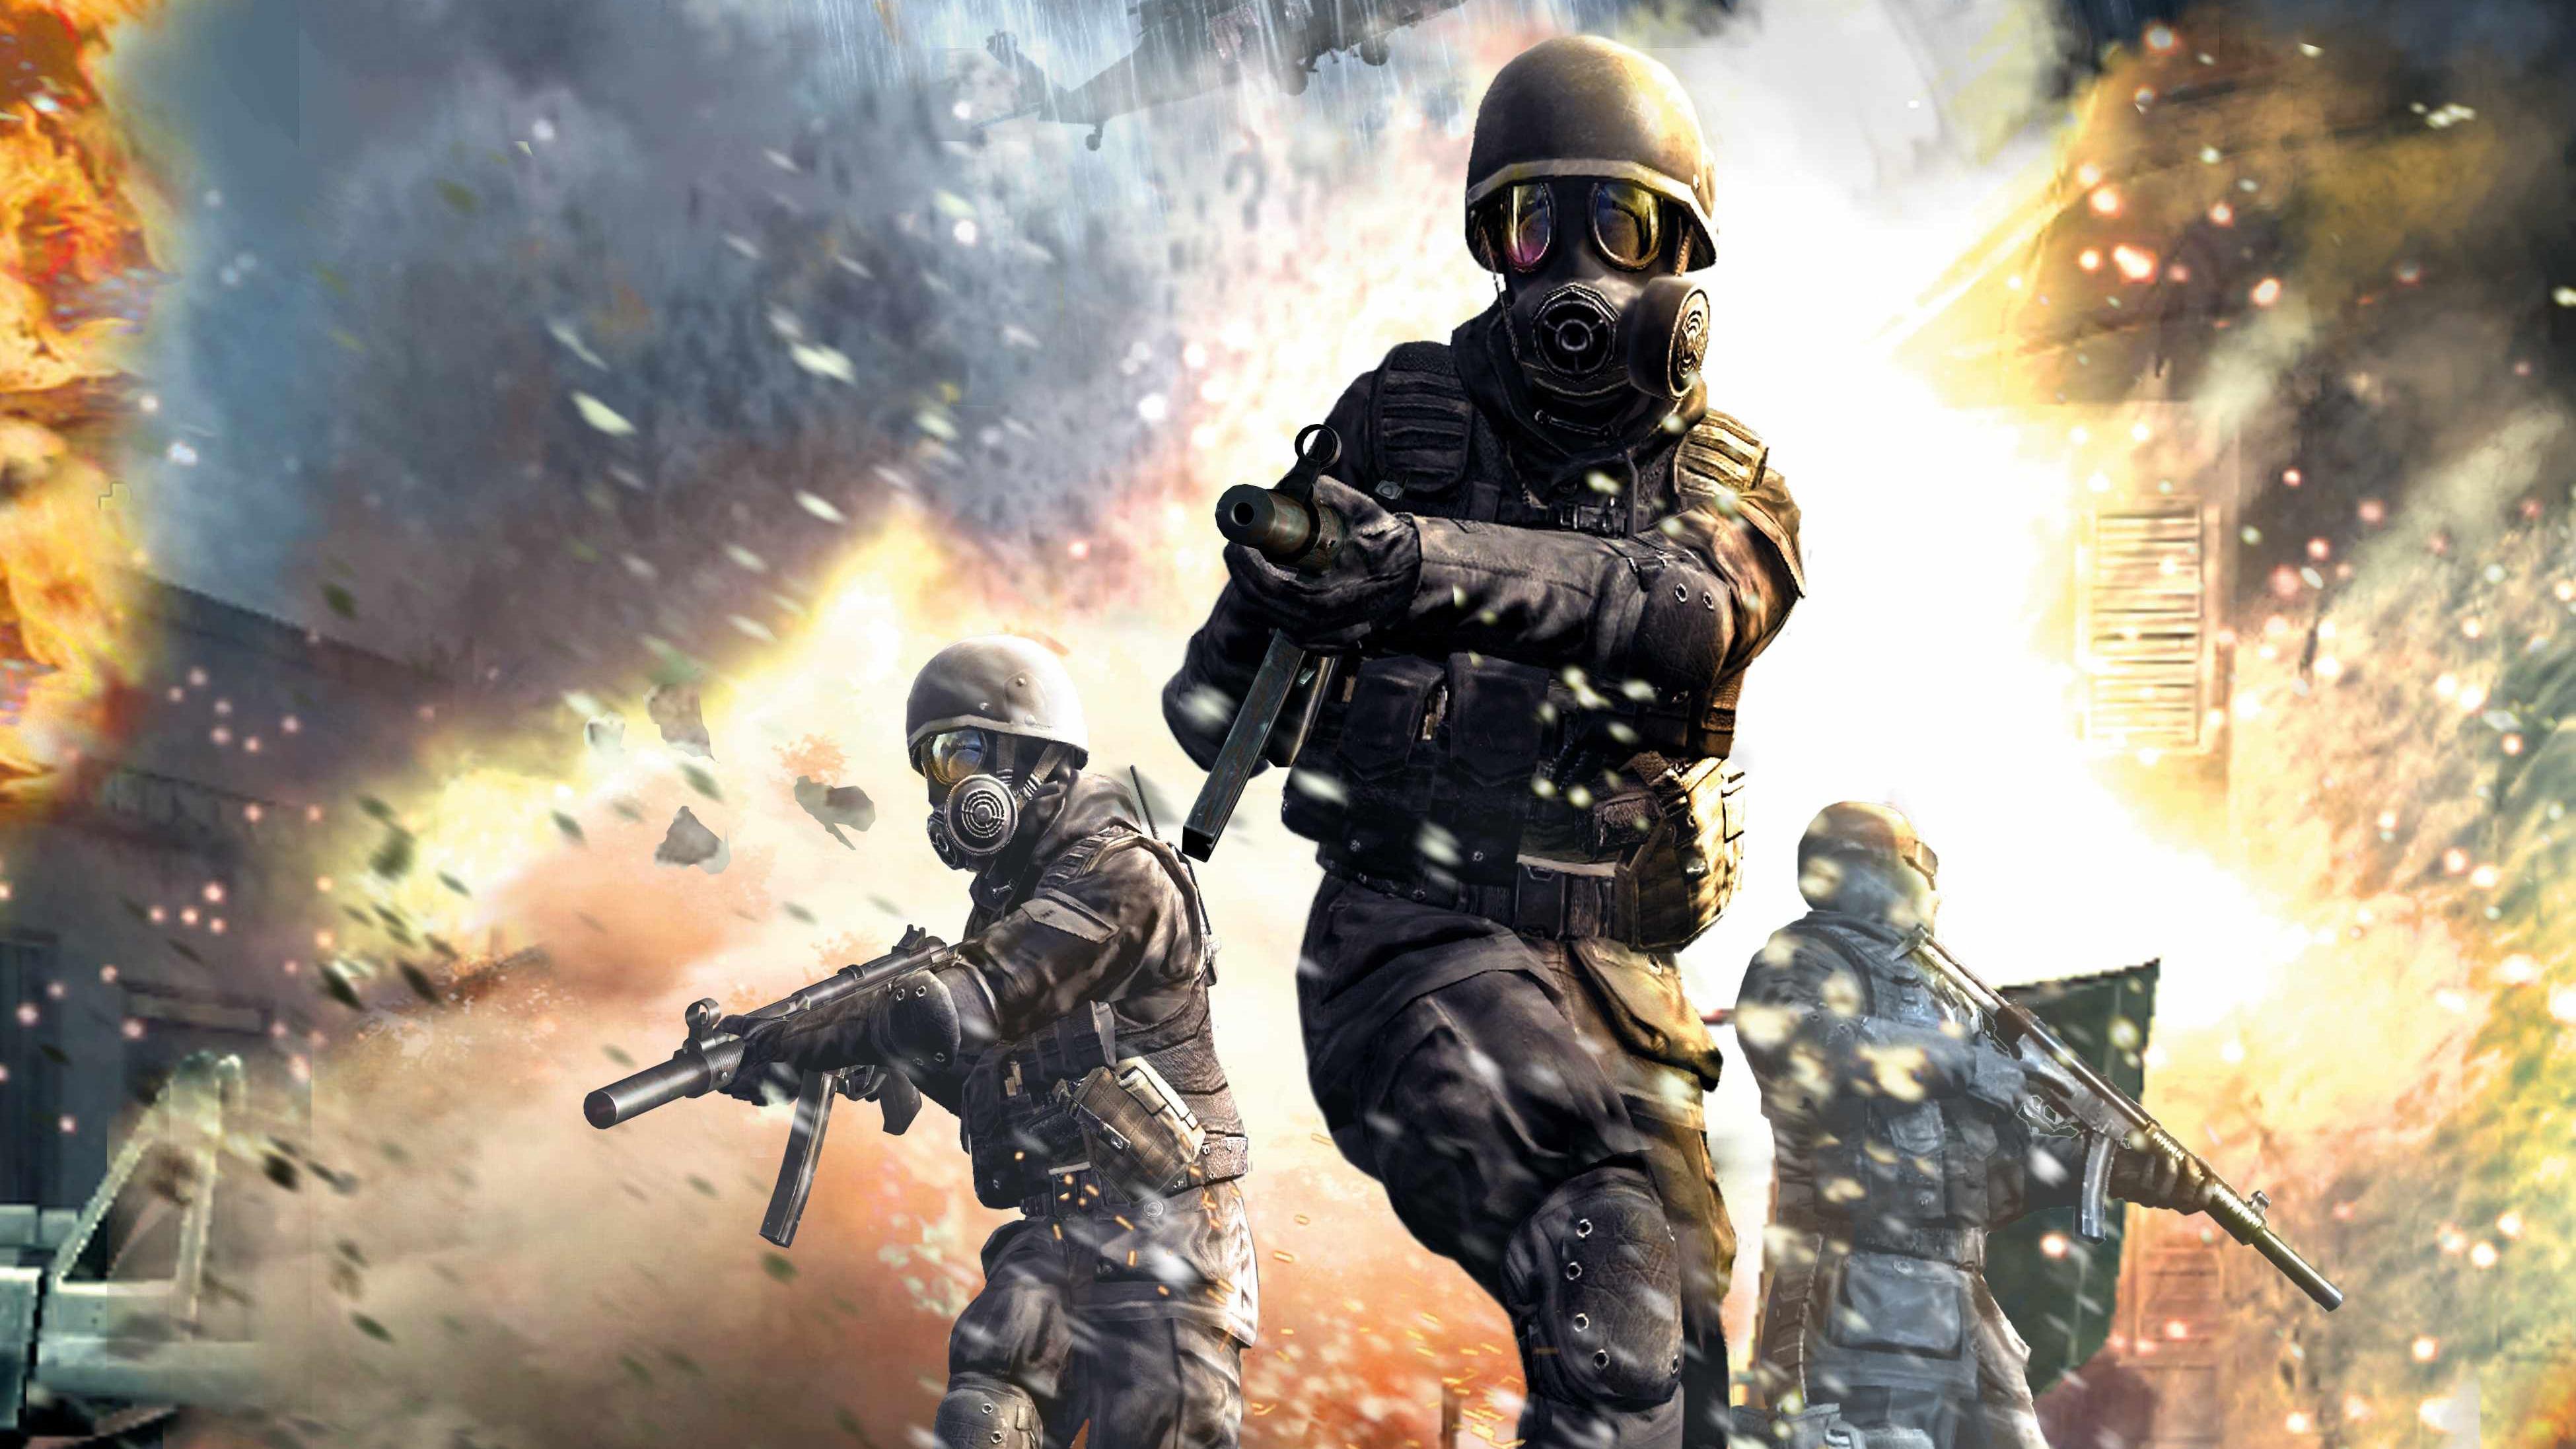 Download Call Of Duty Modern Warfare Wallpaper 2019